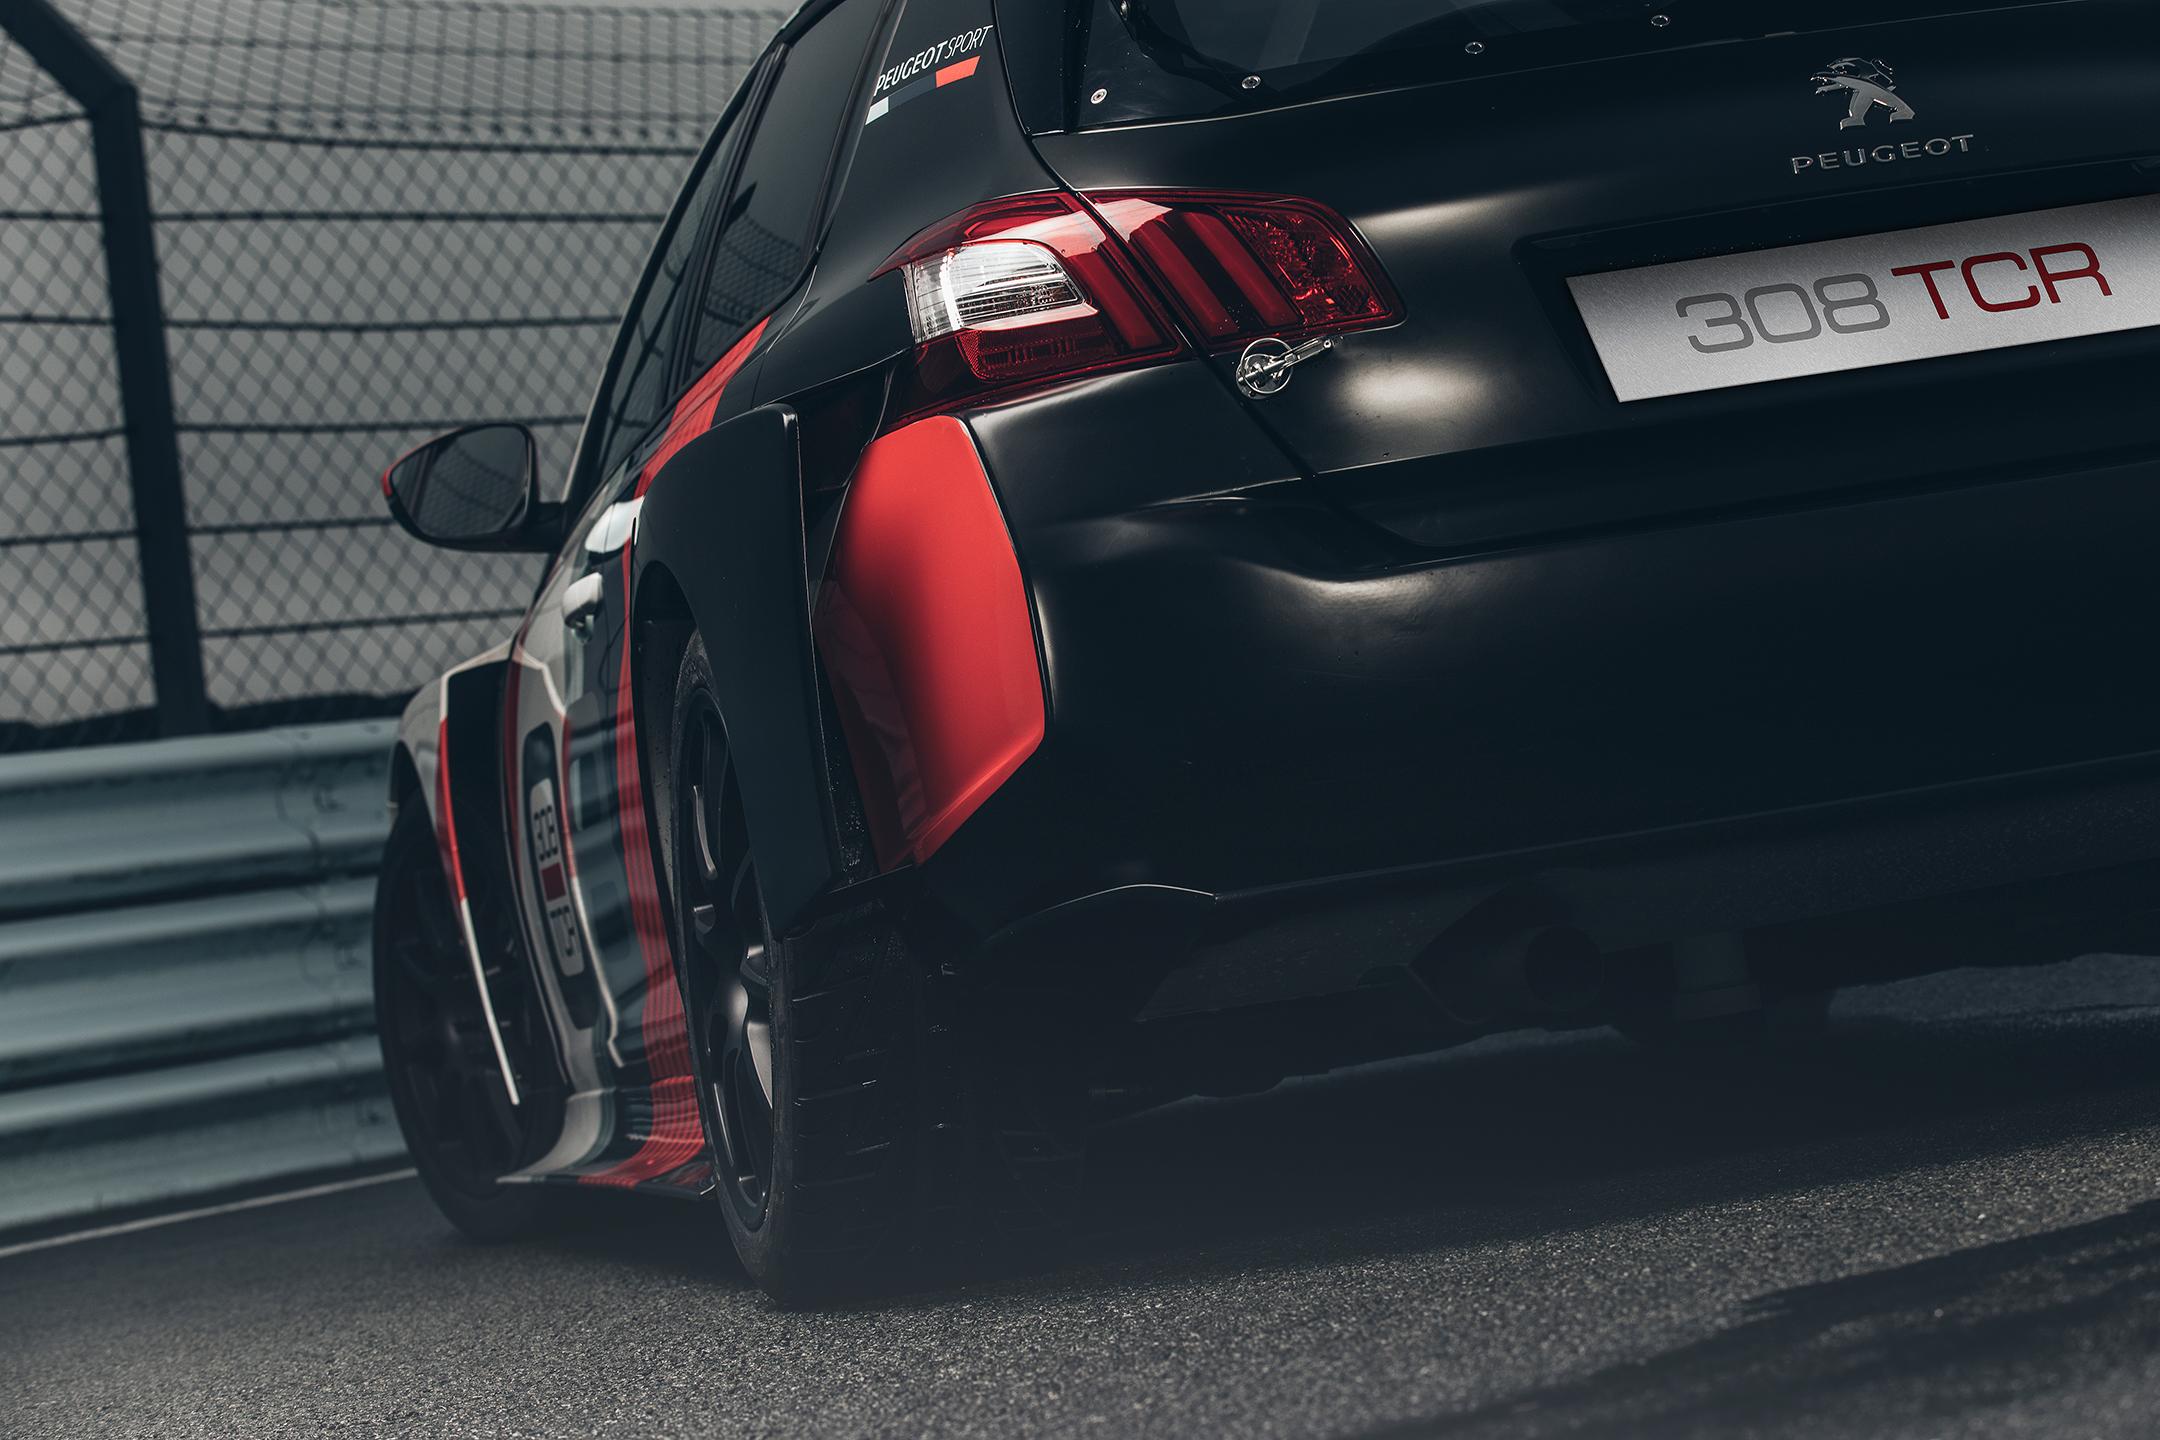 Peugeot 308TCR - 2018 - rear / arrière - zoom